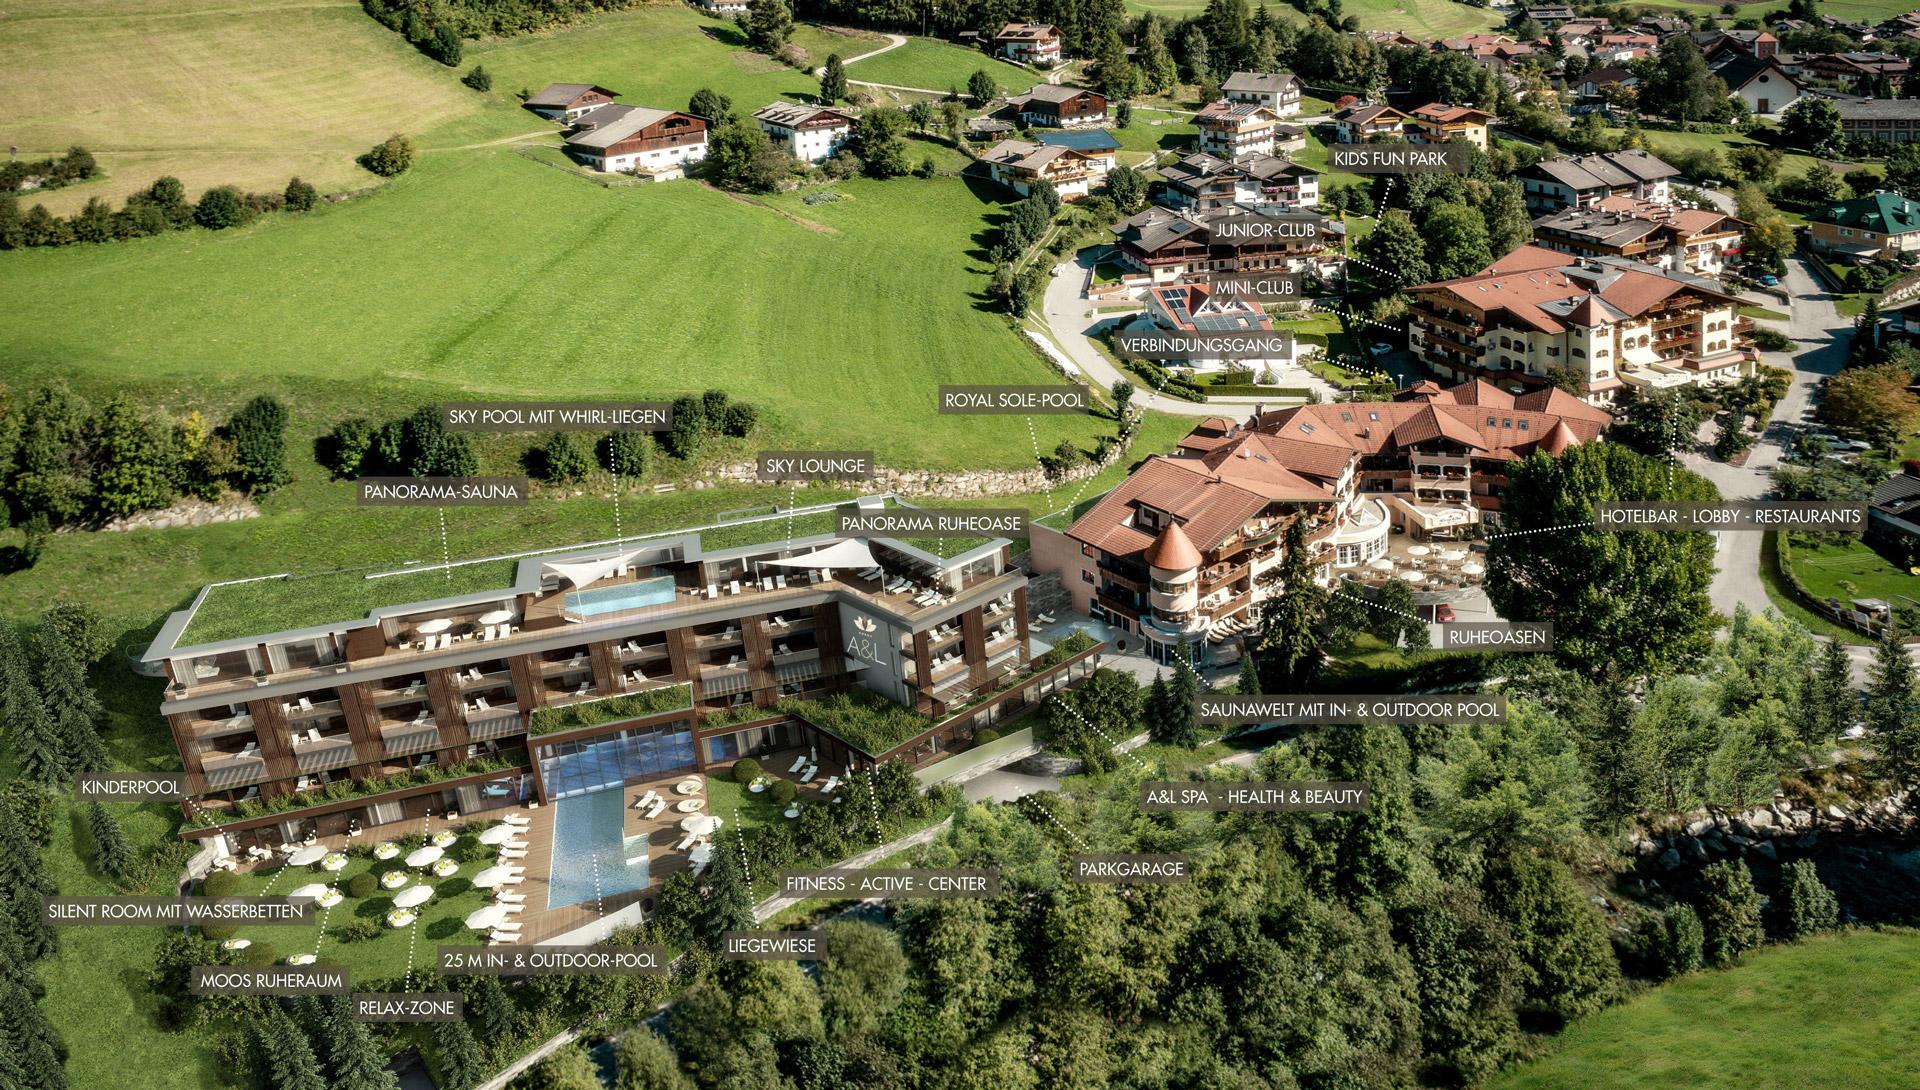 Thumbnail for Das 4 Sterne Superior ALPENSCHLÖSSL & LINDERHOF Wellnesshotel in Südtirol, Alpenschlössl & Linderhof